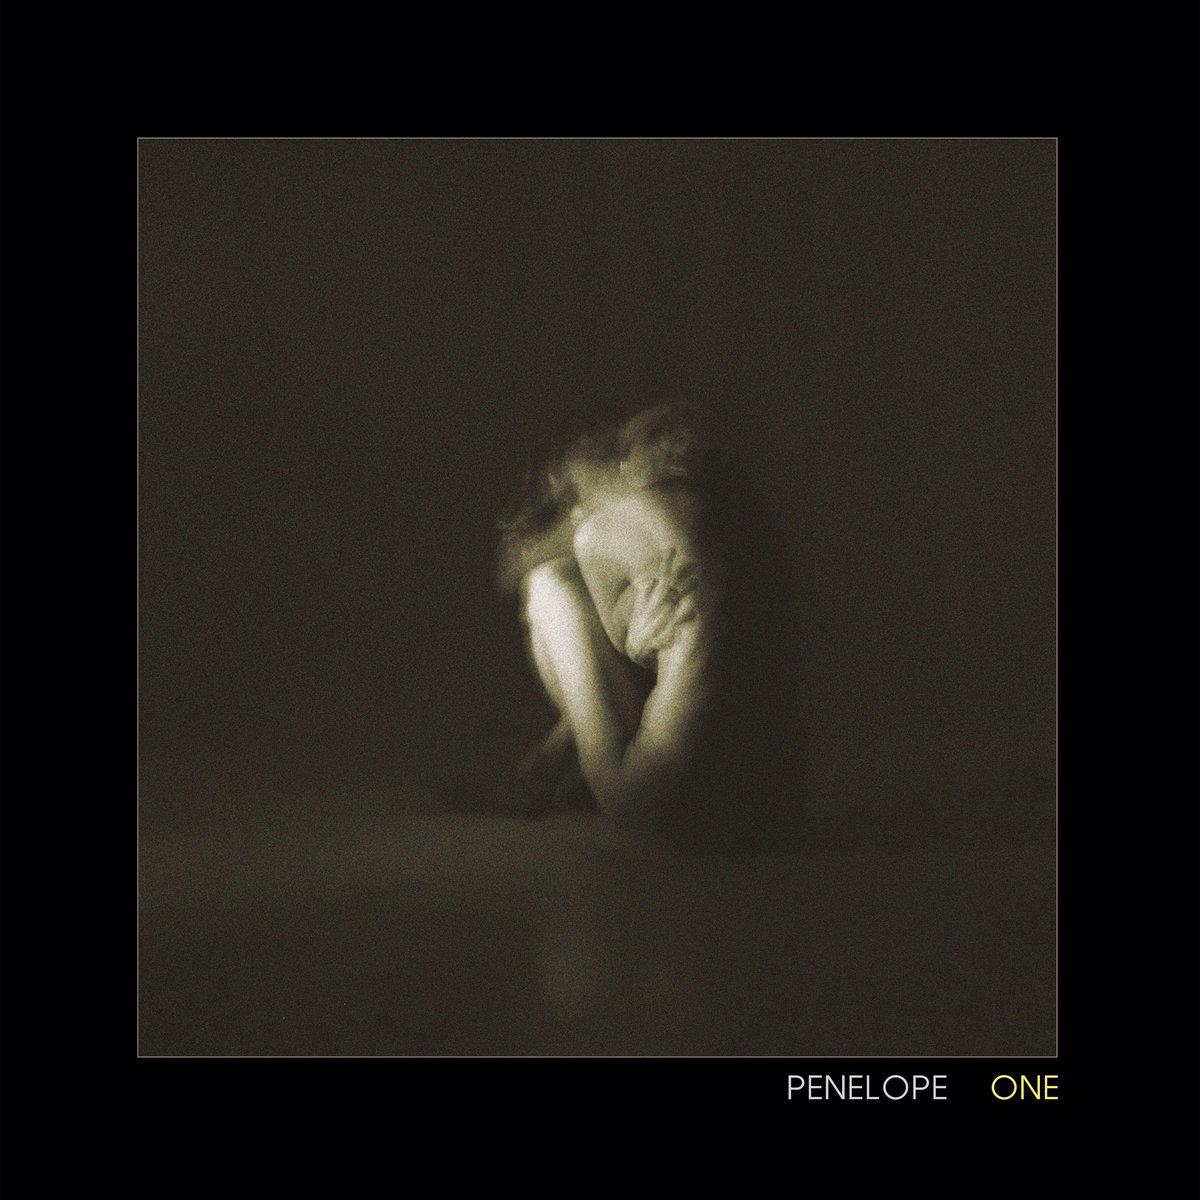 Penelope One album cover